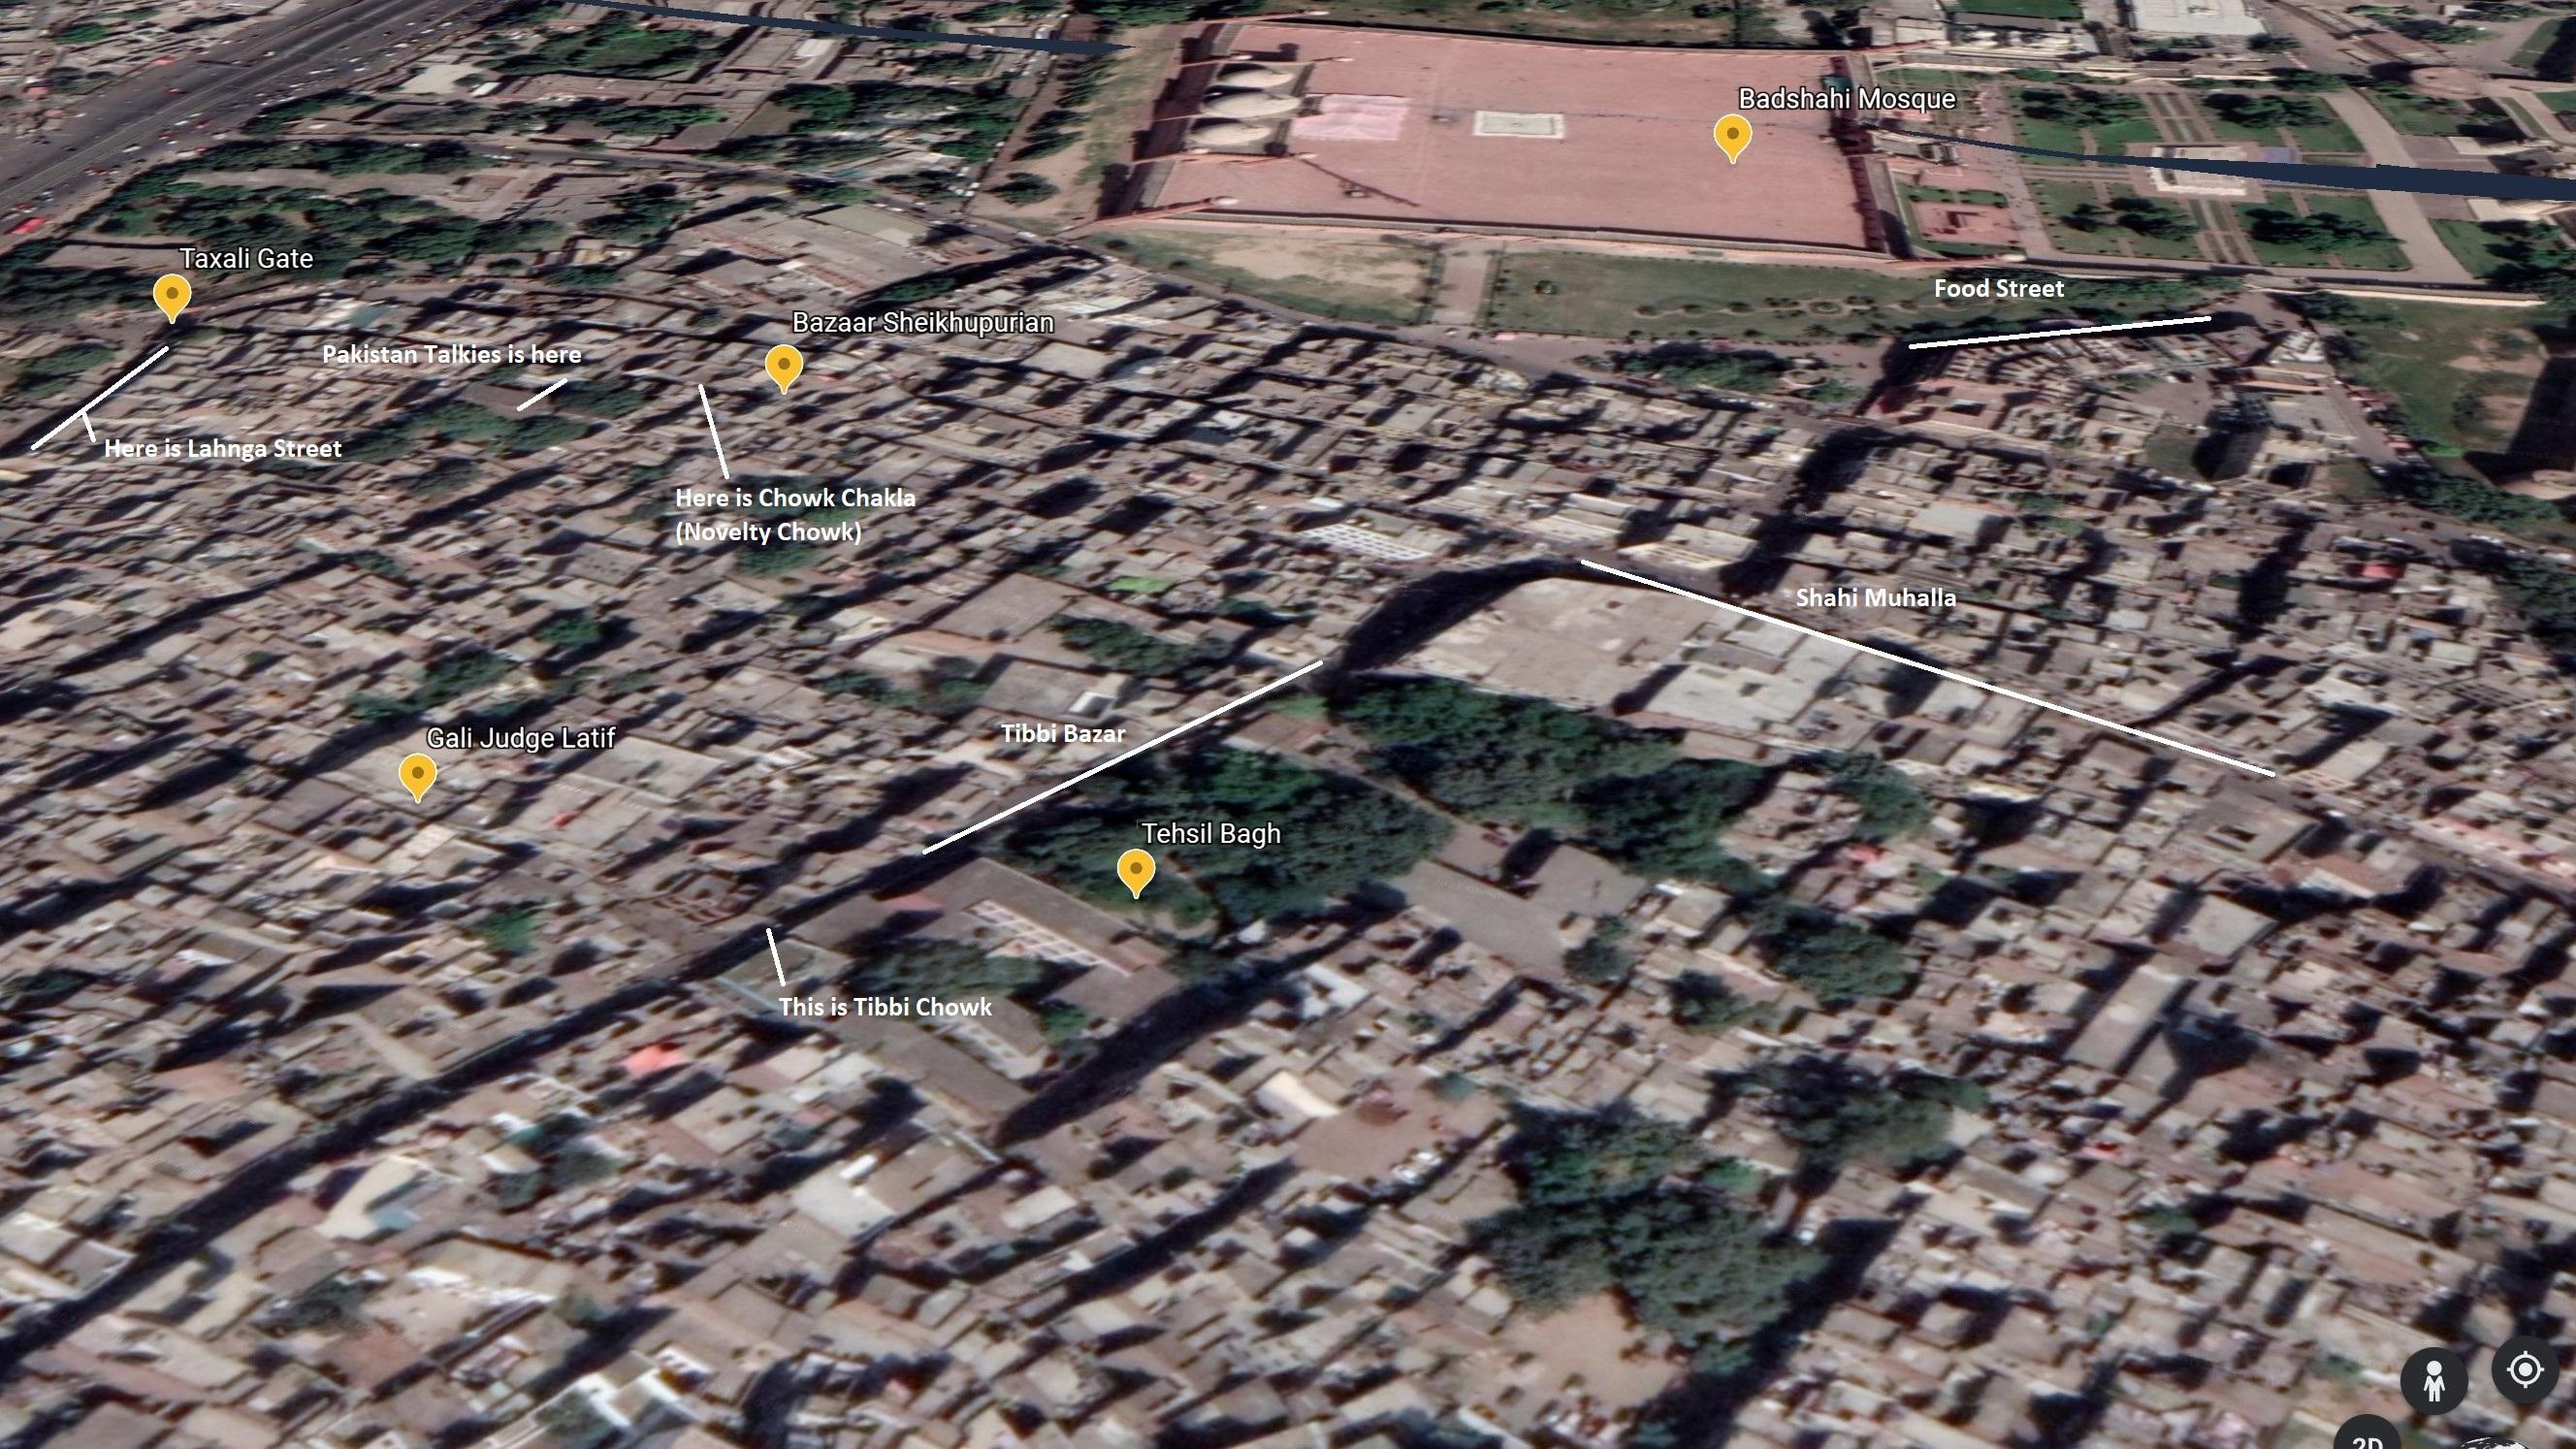 Tuxali Gate